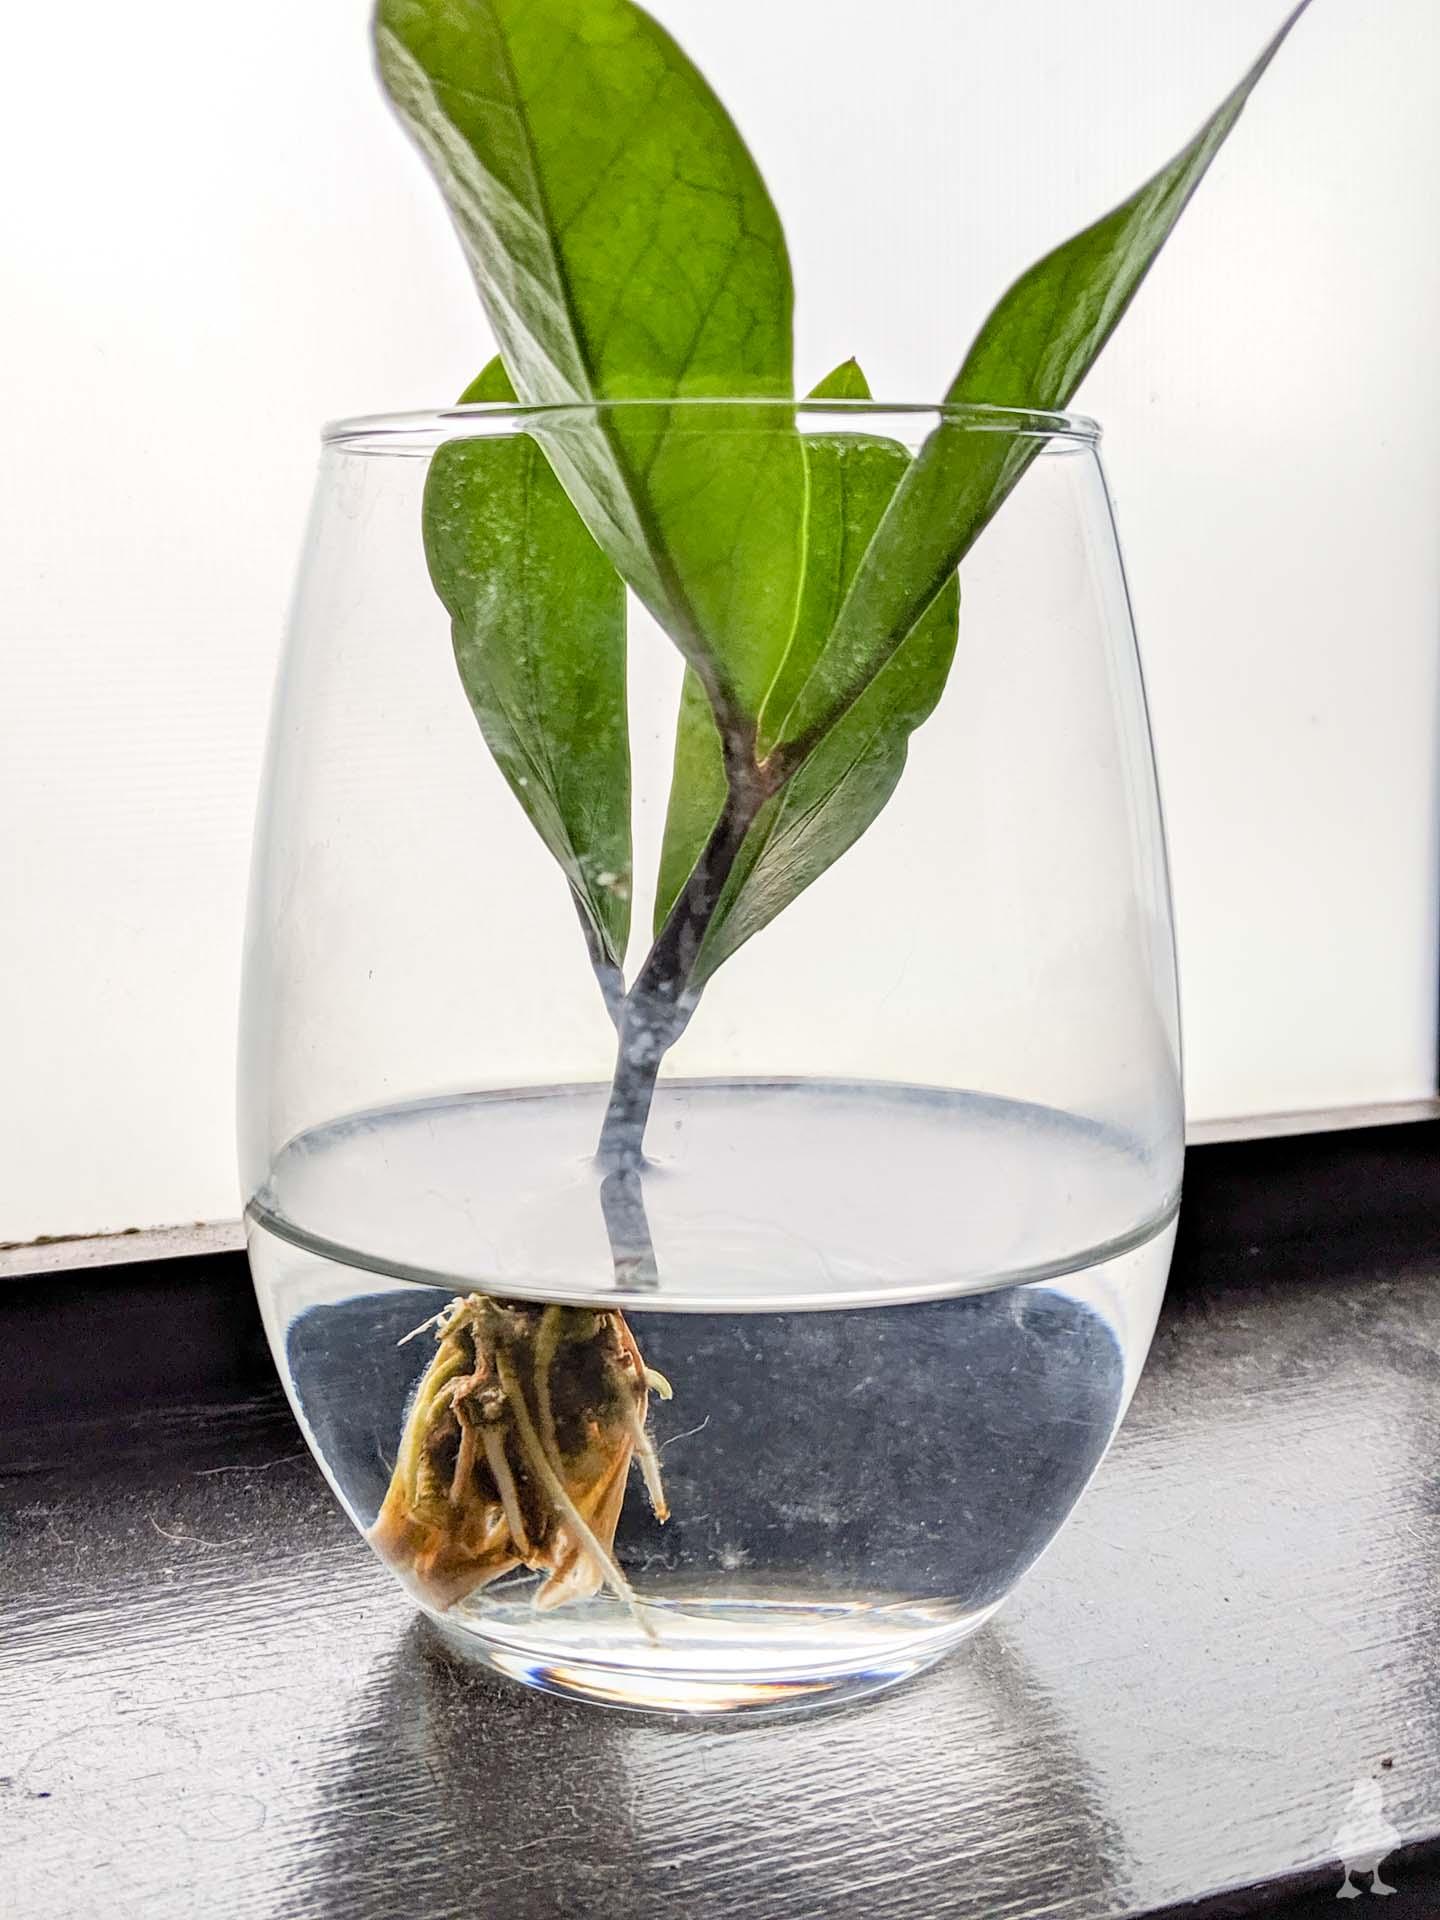 zz plant water propagation